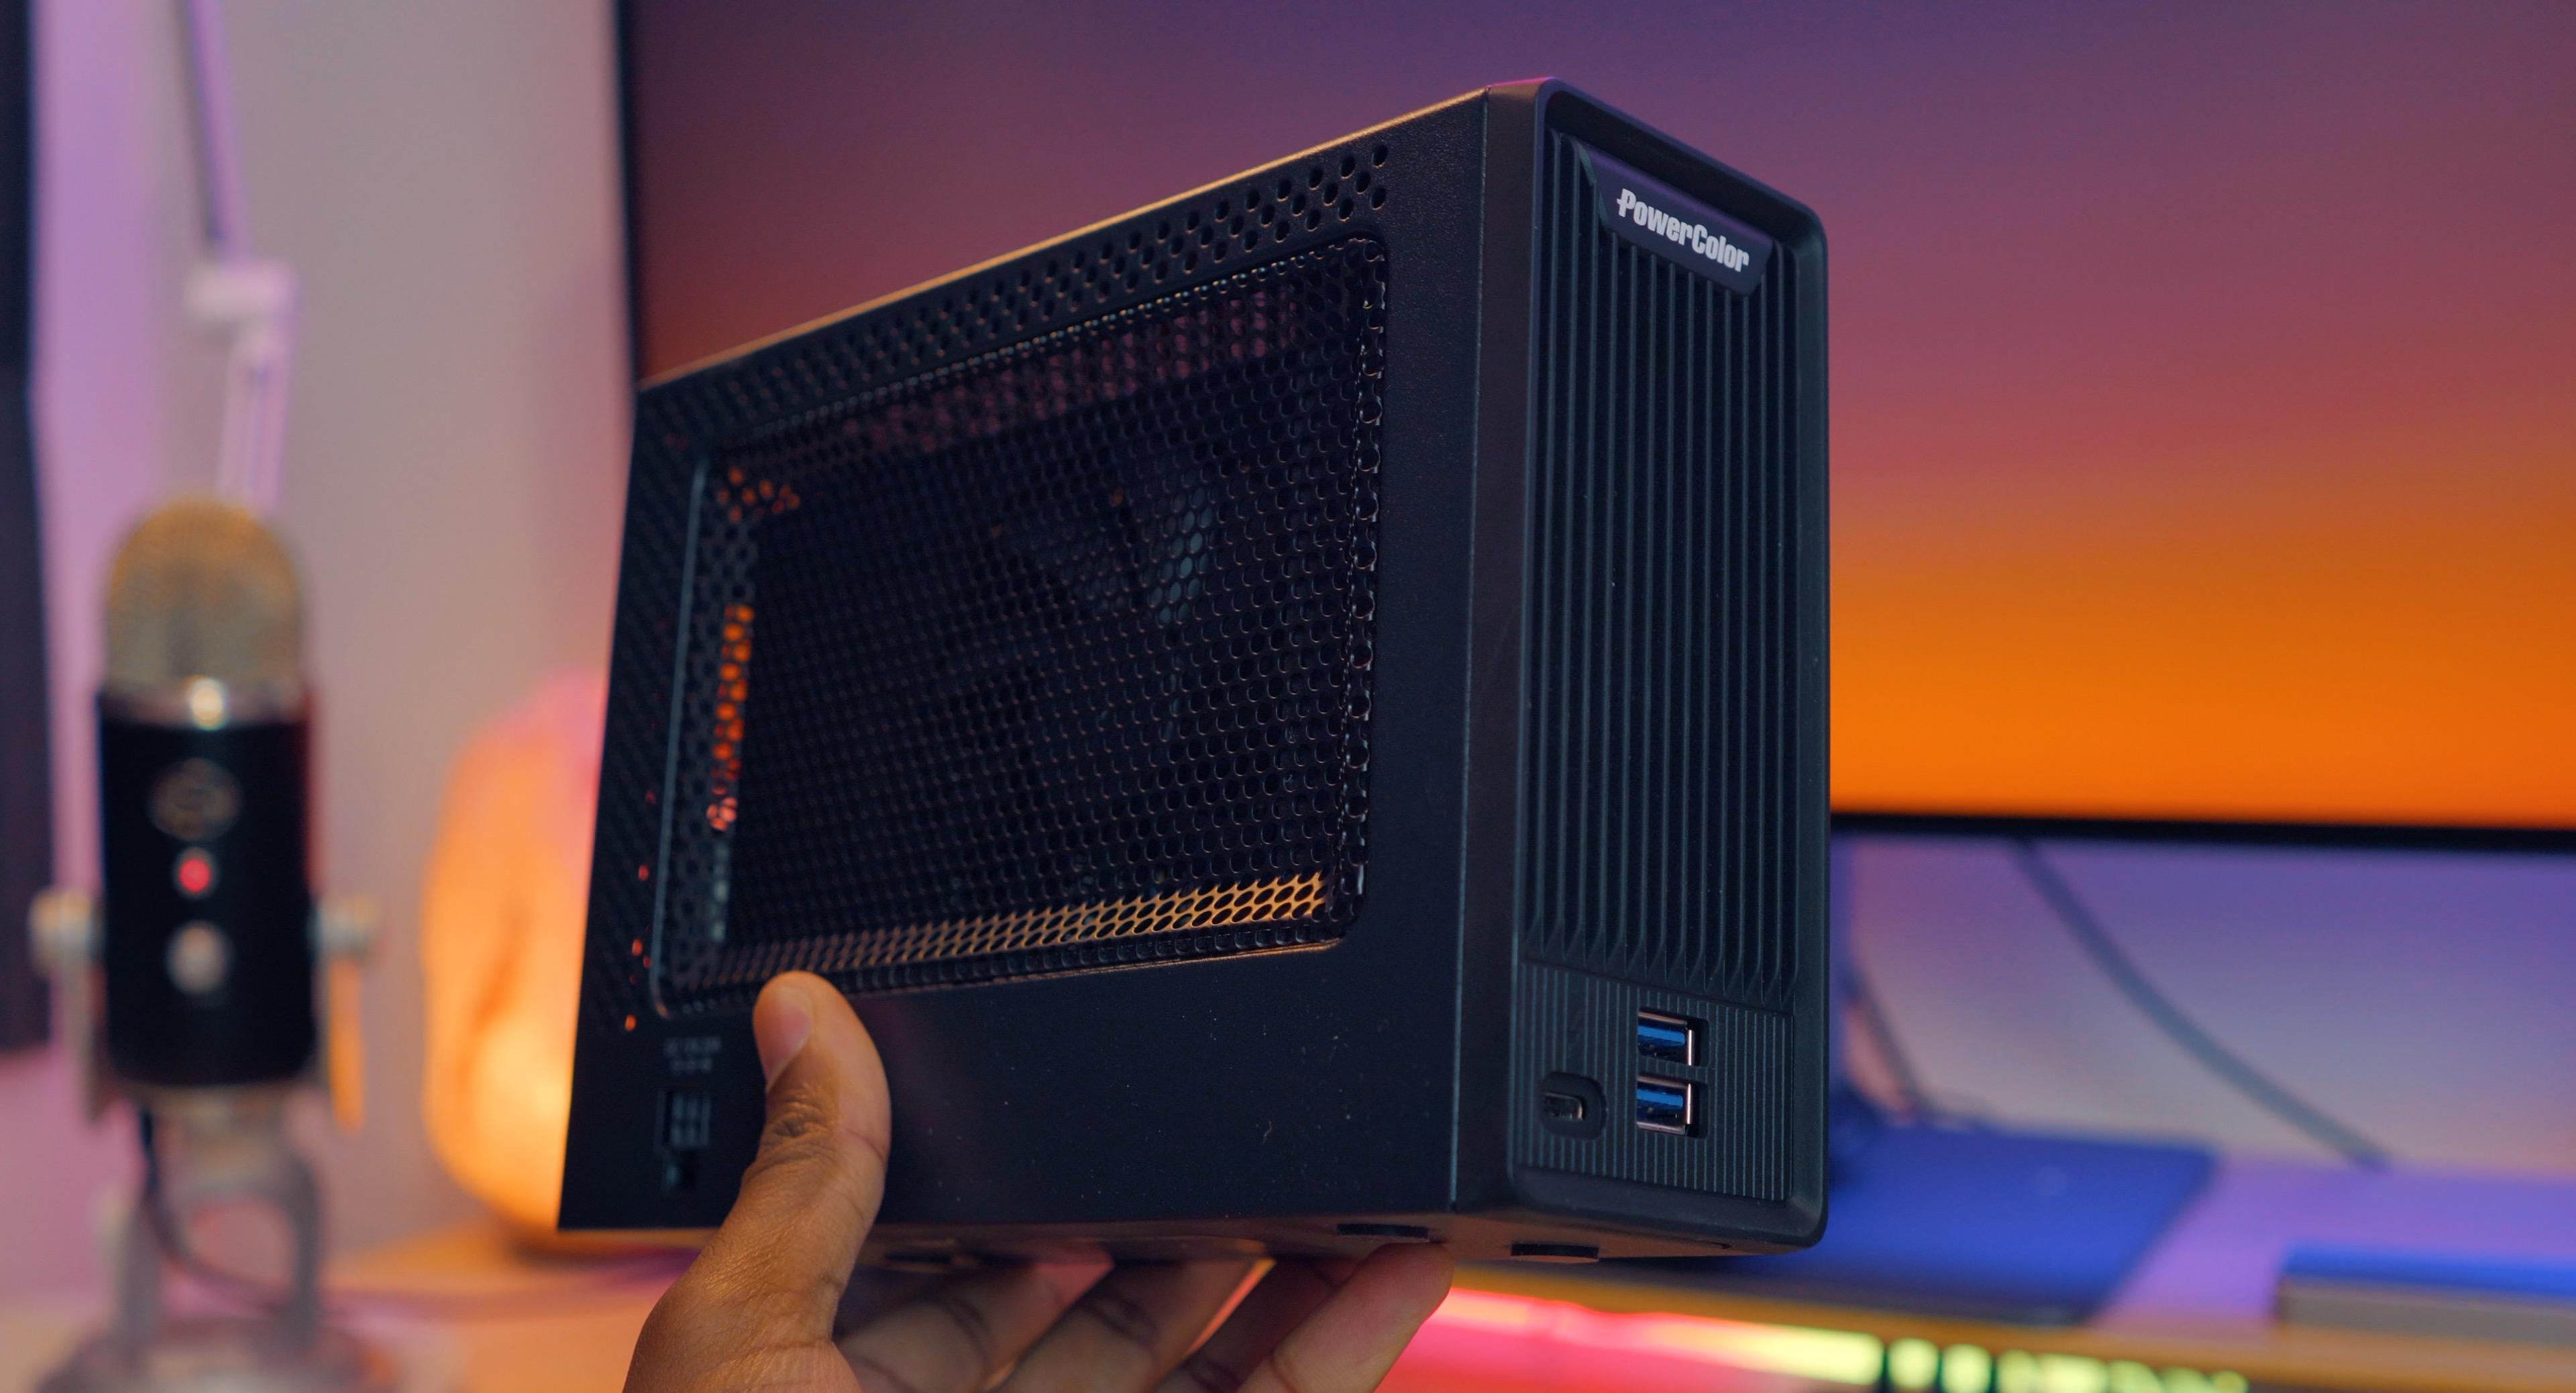 External GPU in hand